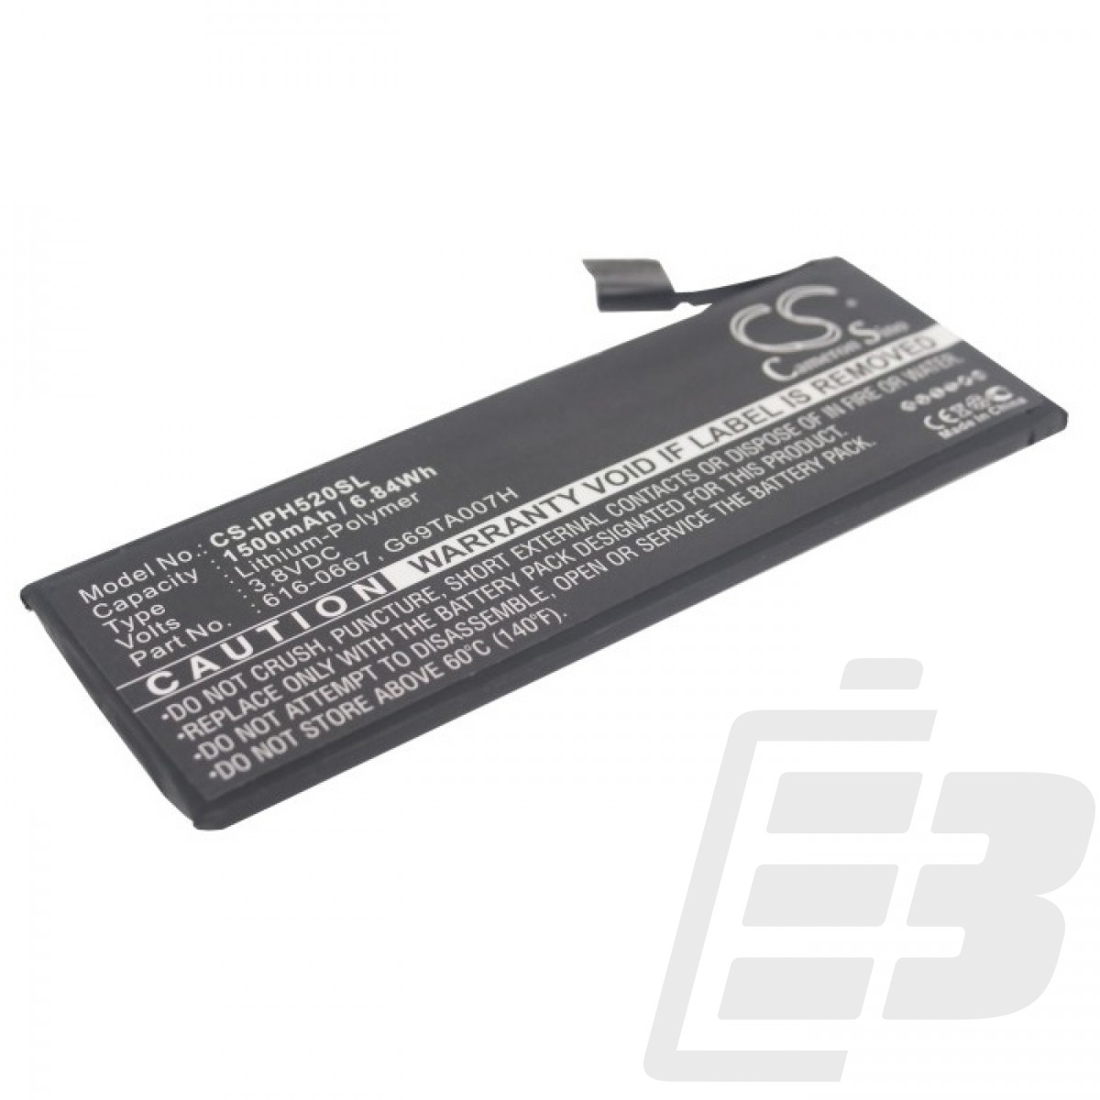 Smartphone battery Apple iPhone 5C_1